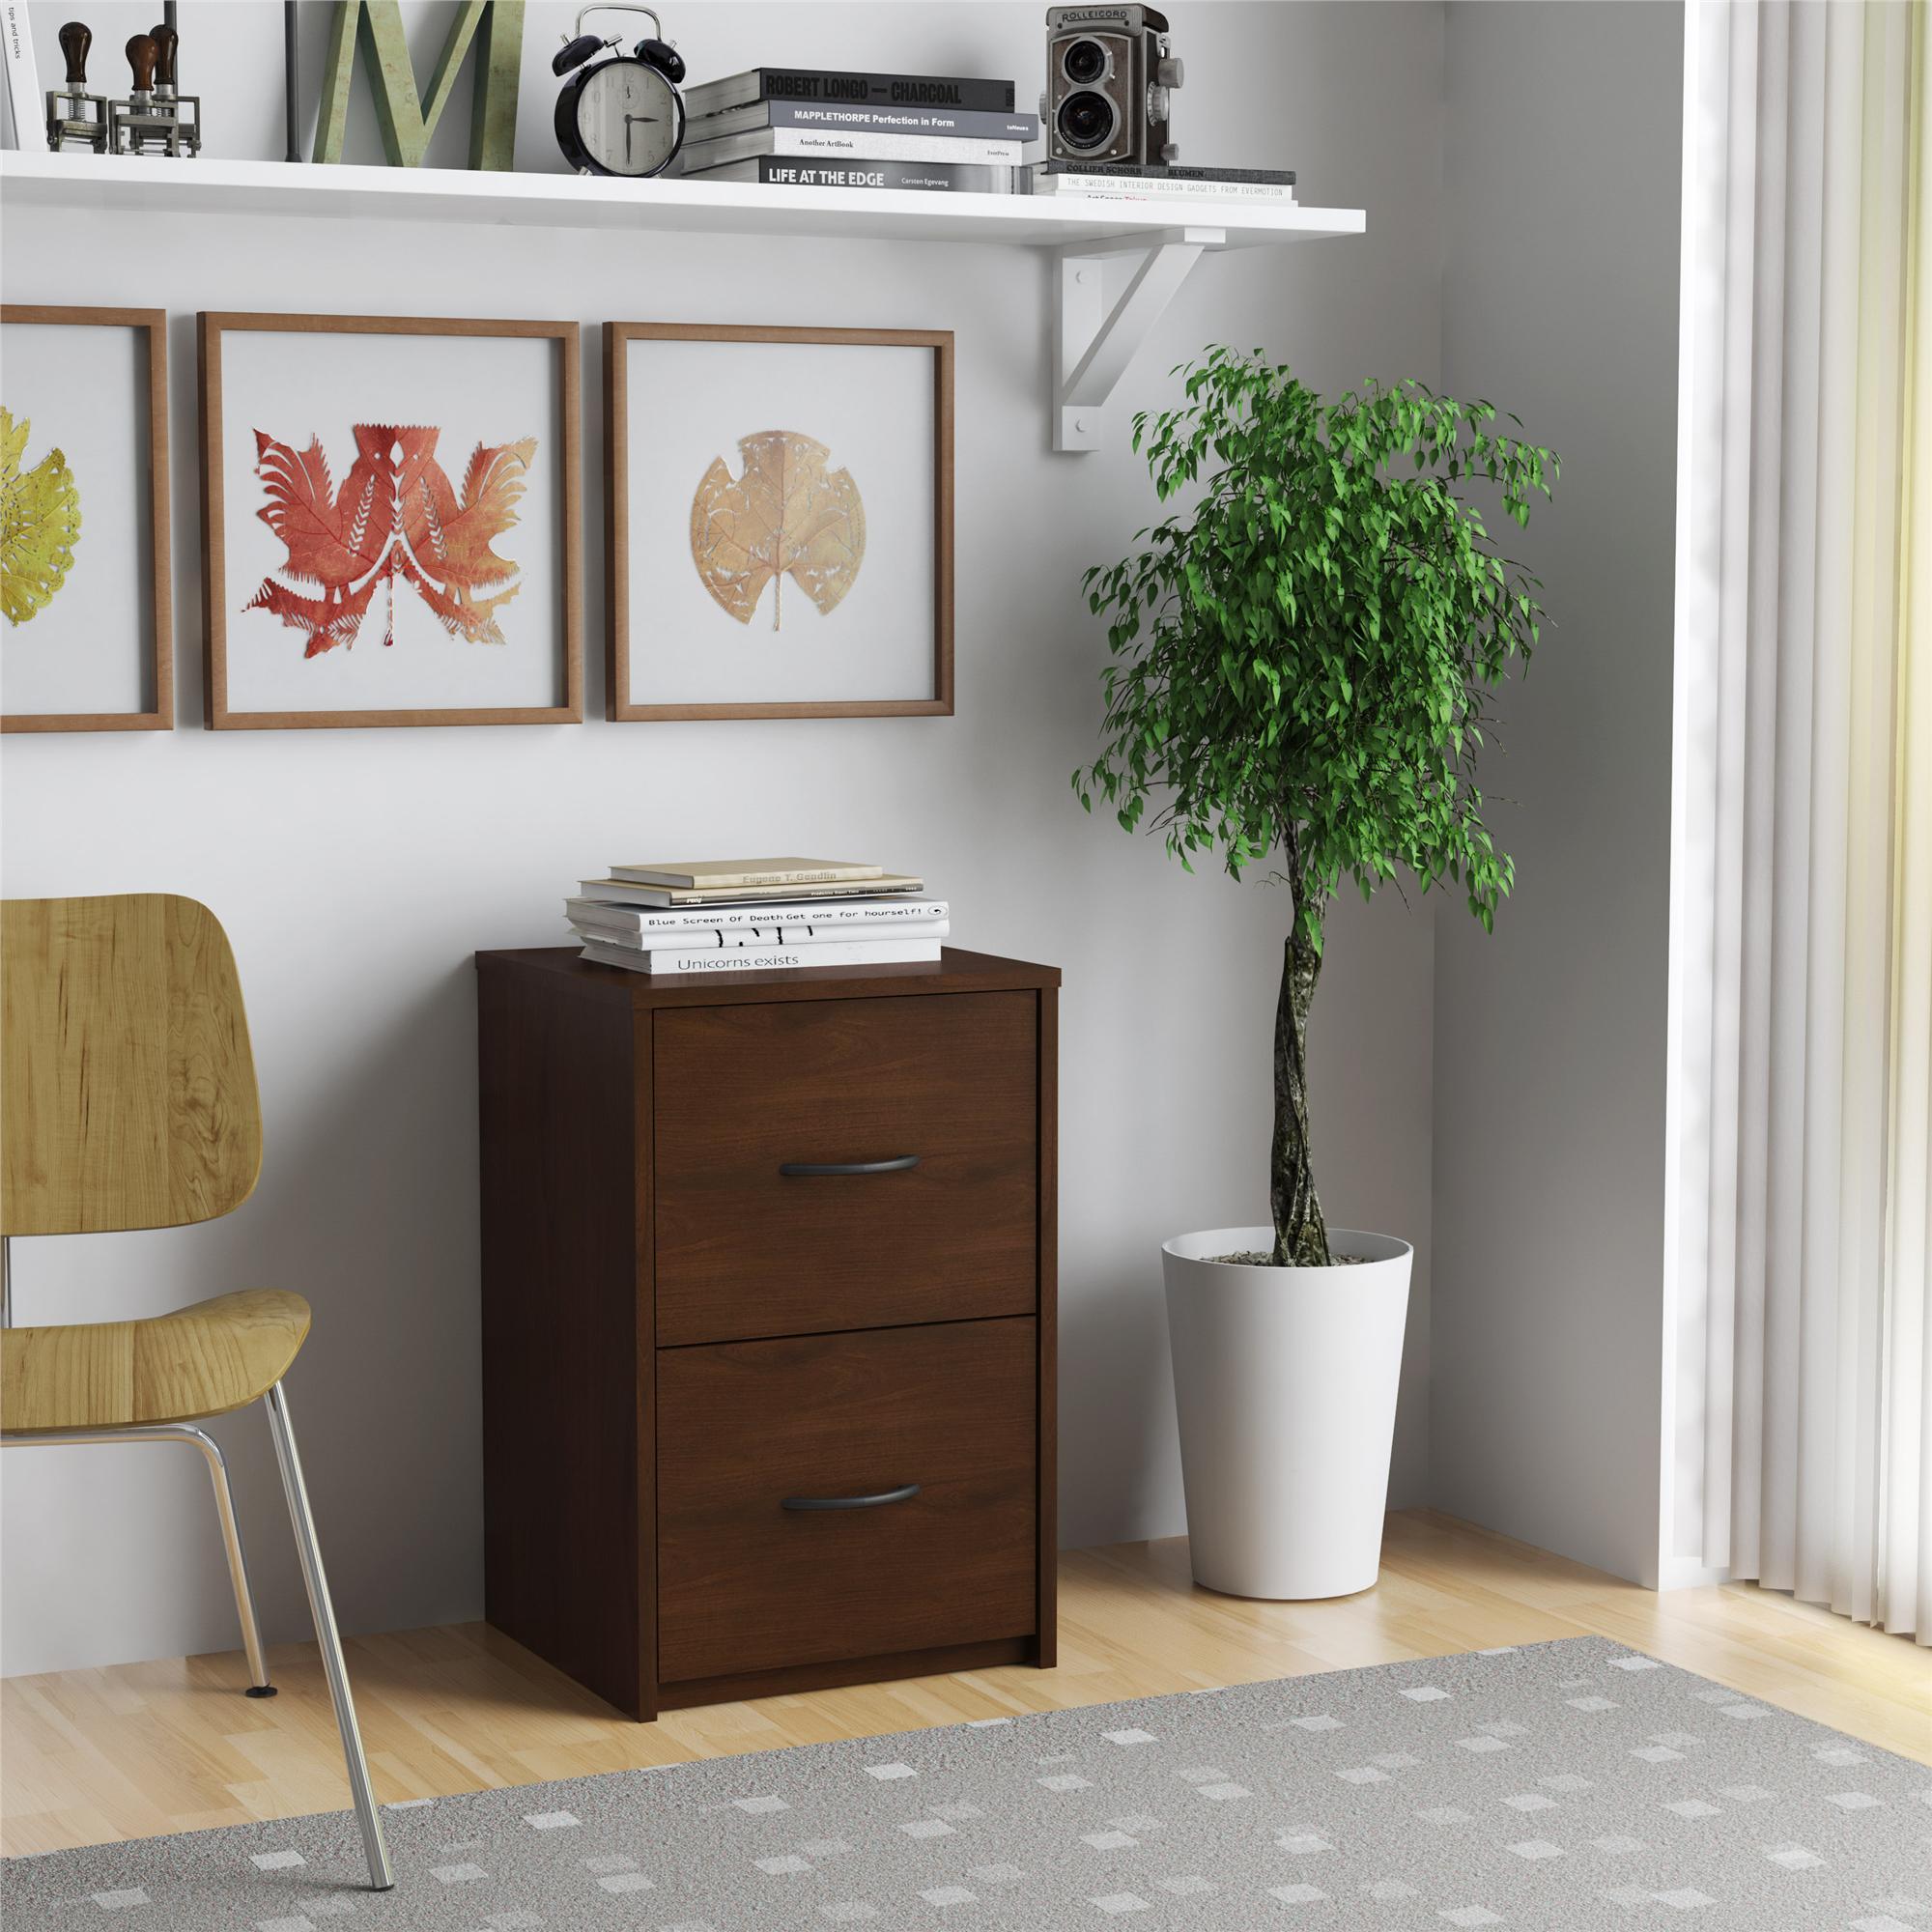 file cabinets - kmart